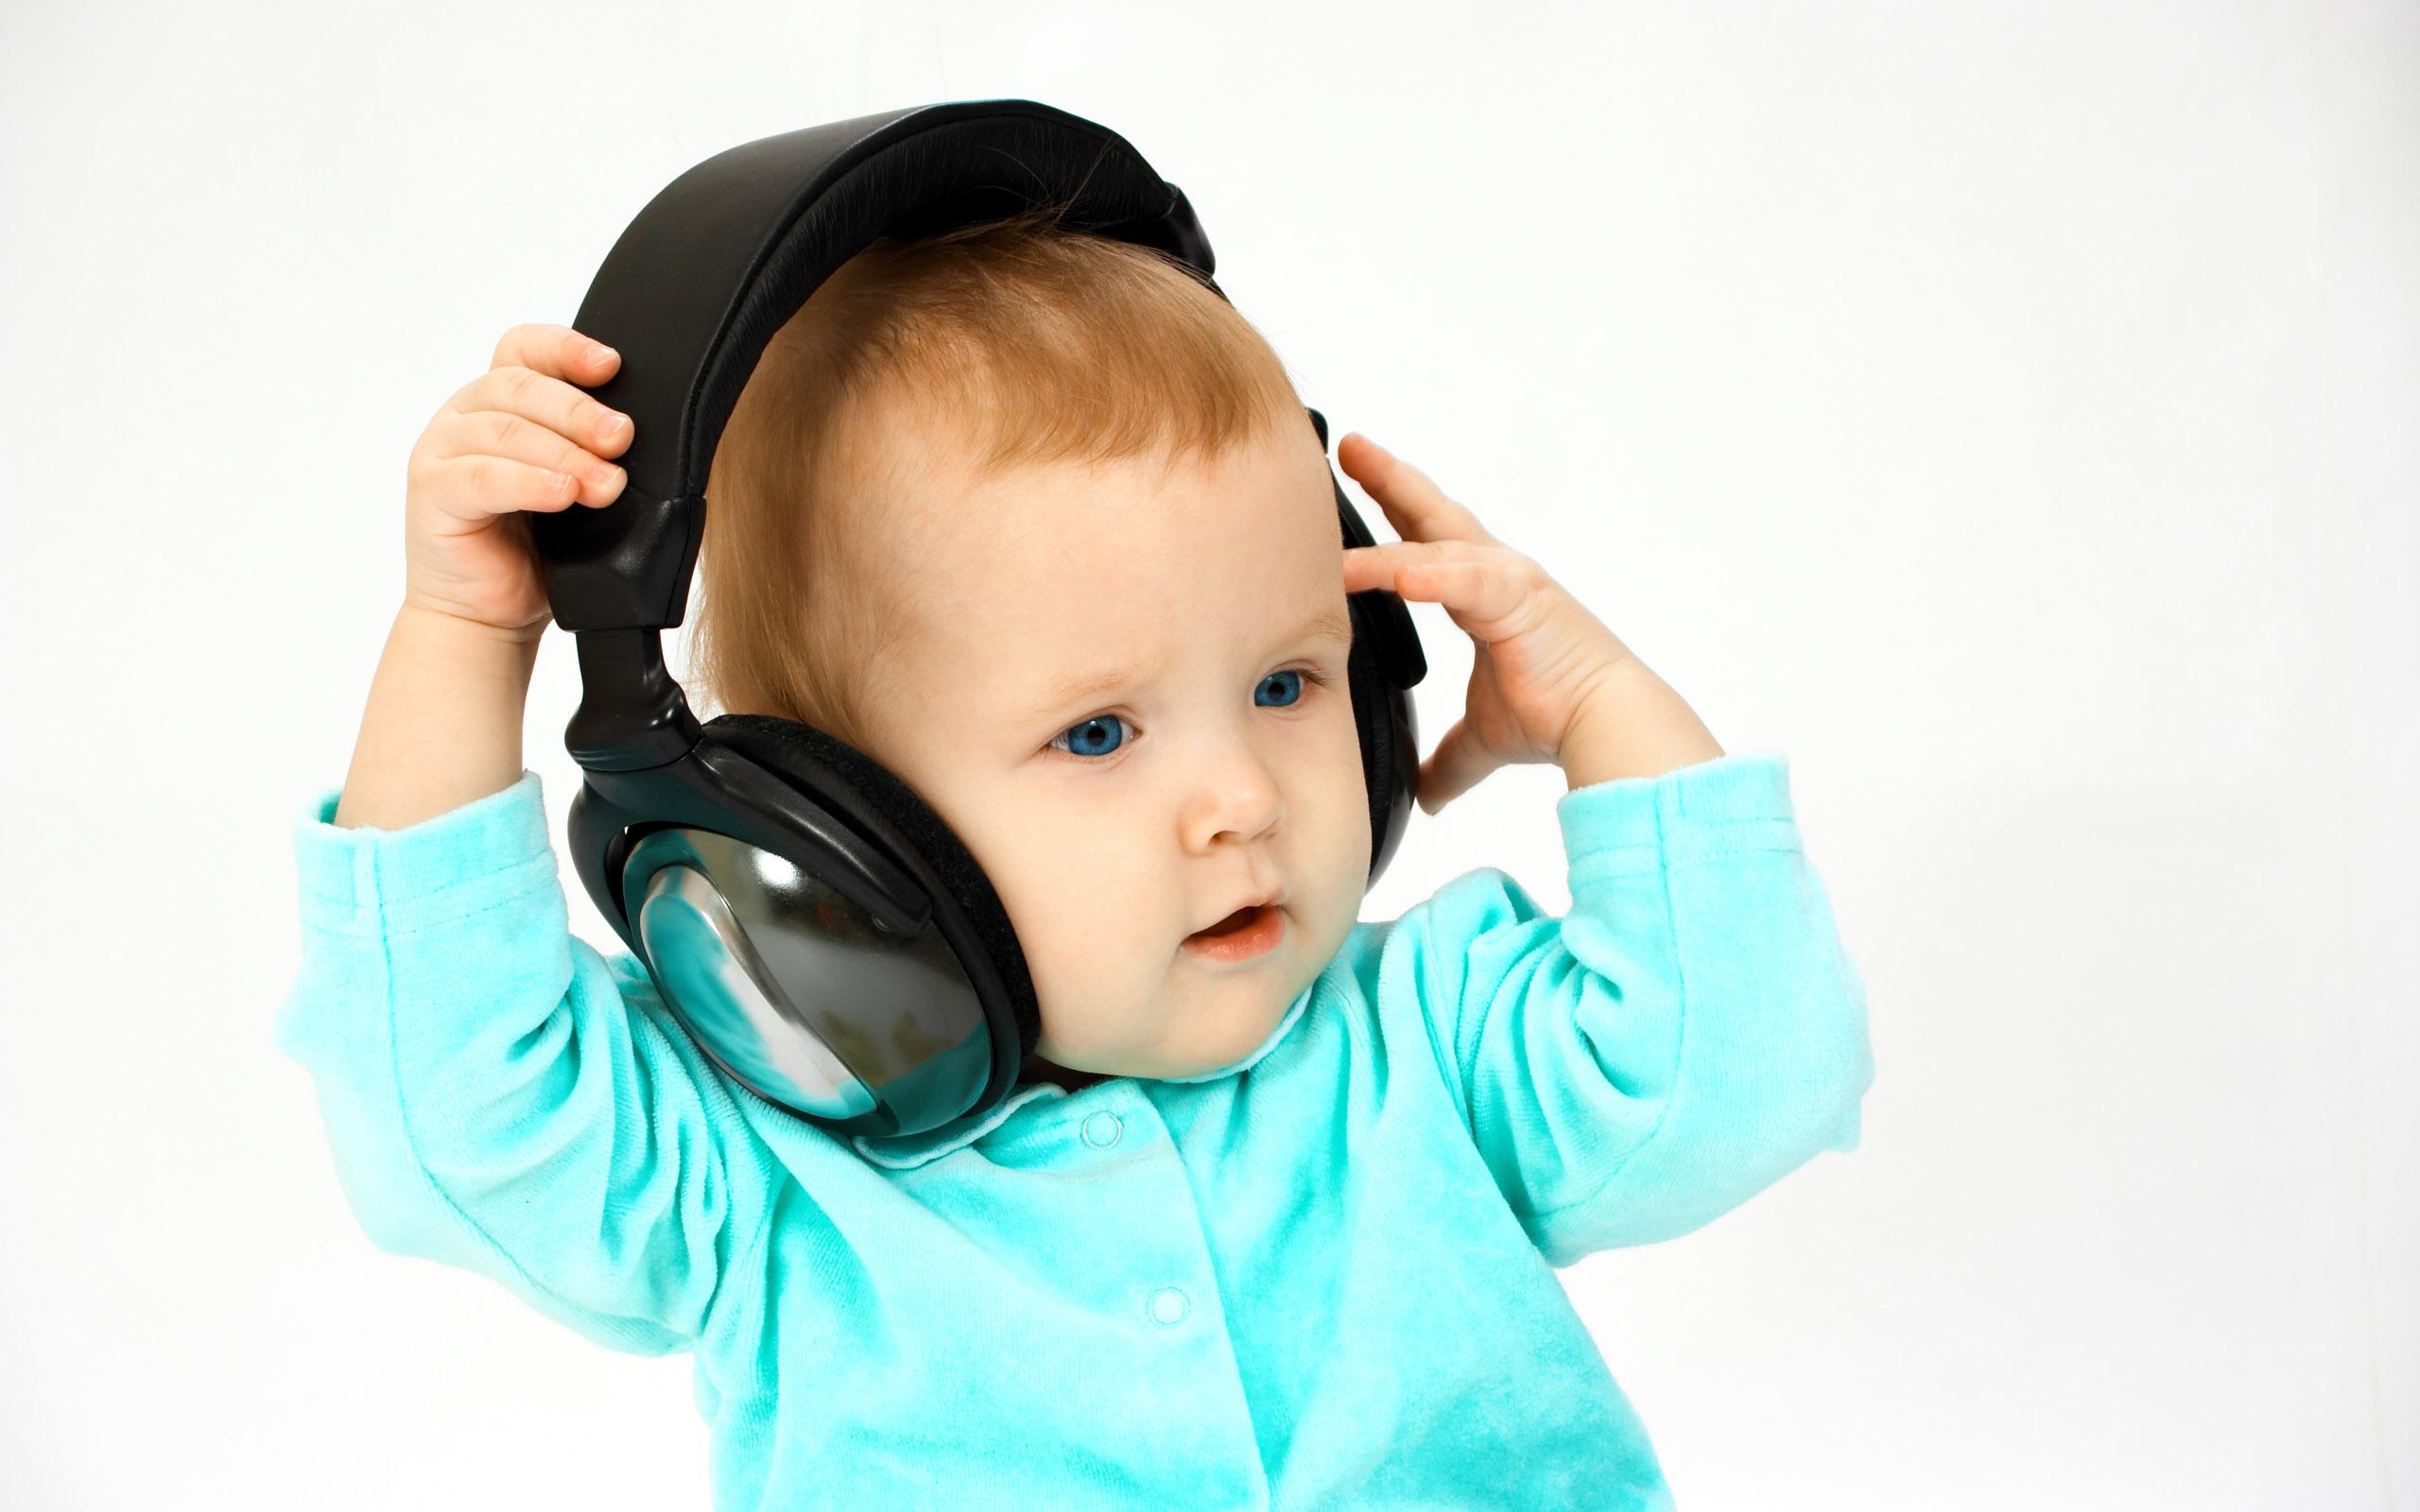 Cute Baby Boy Images Download Pixelstalk Net